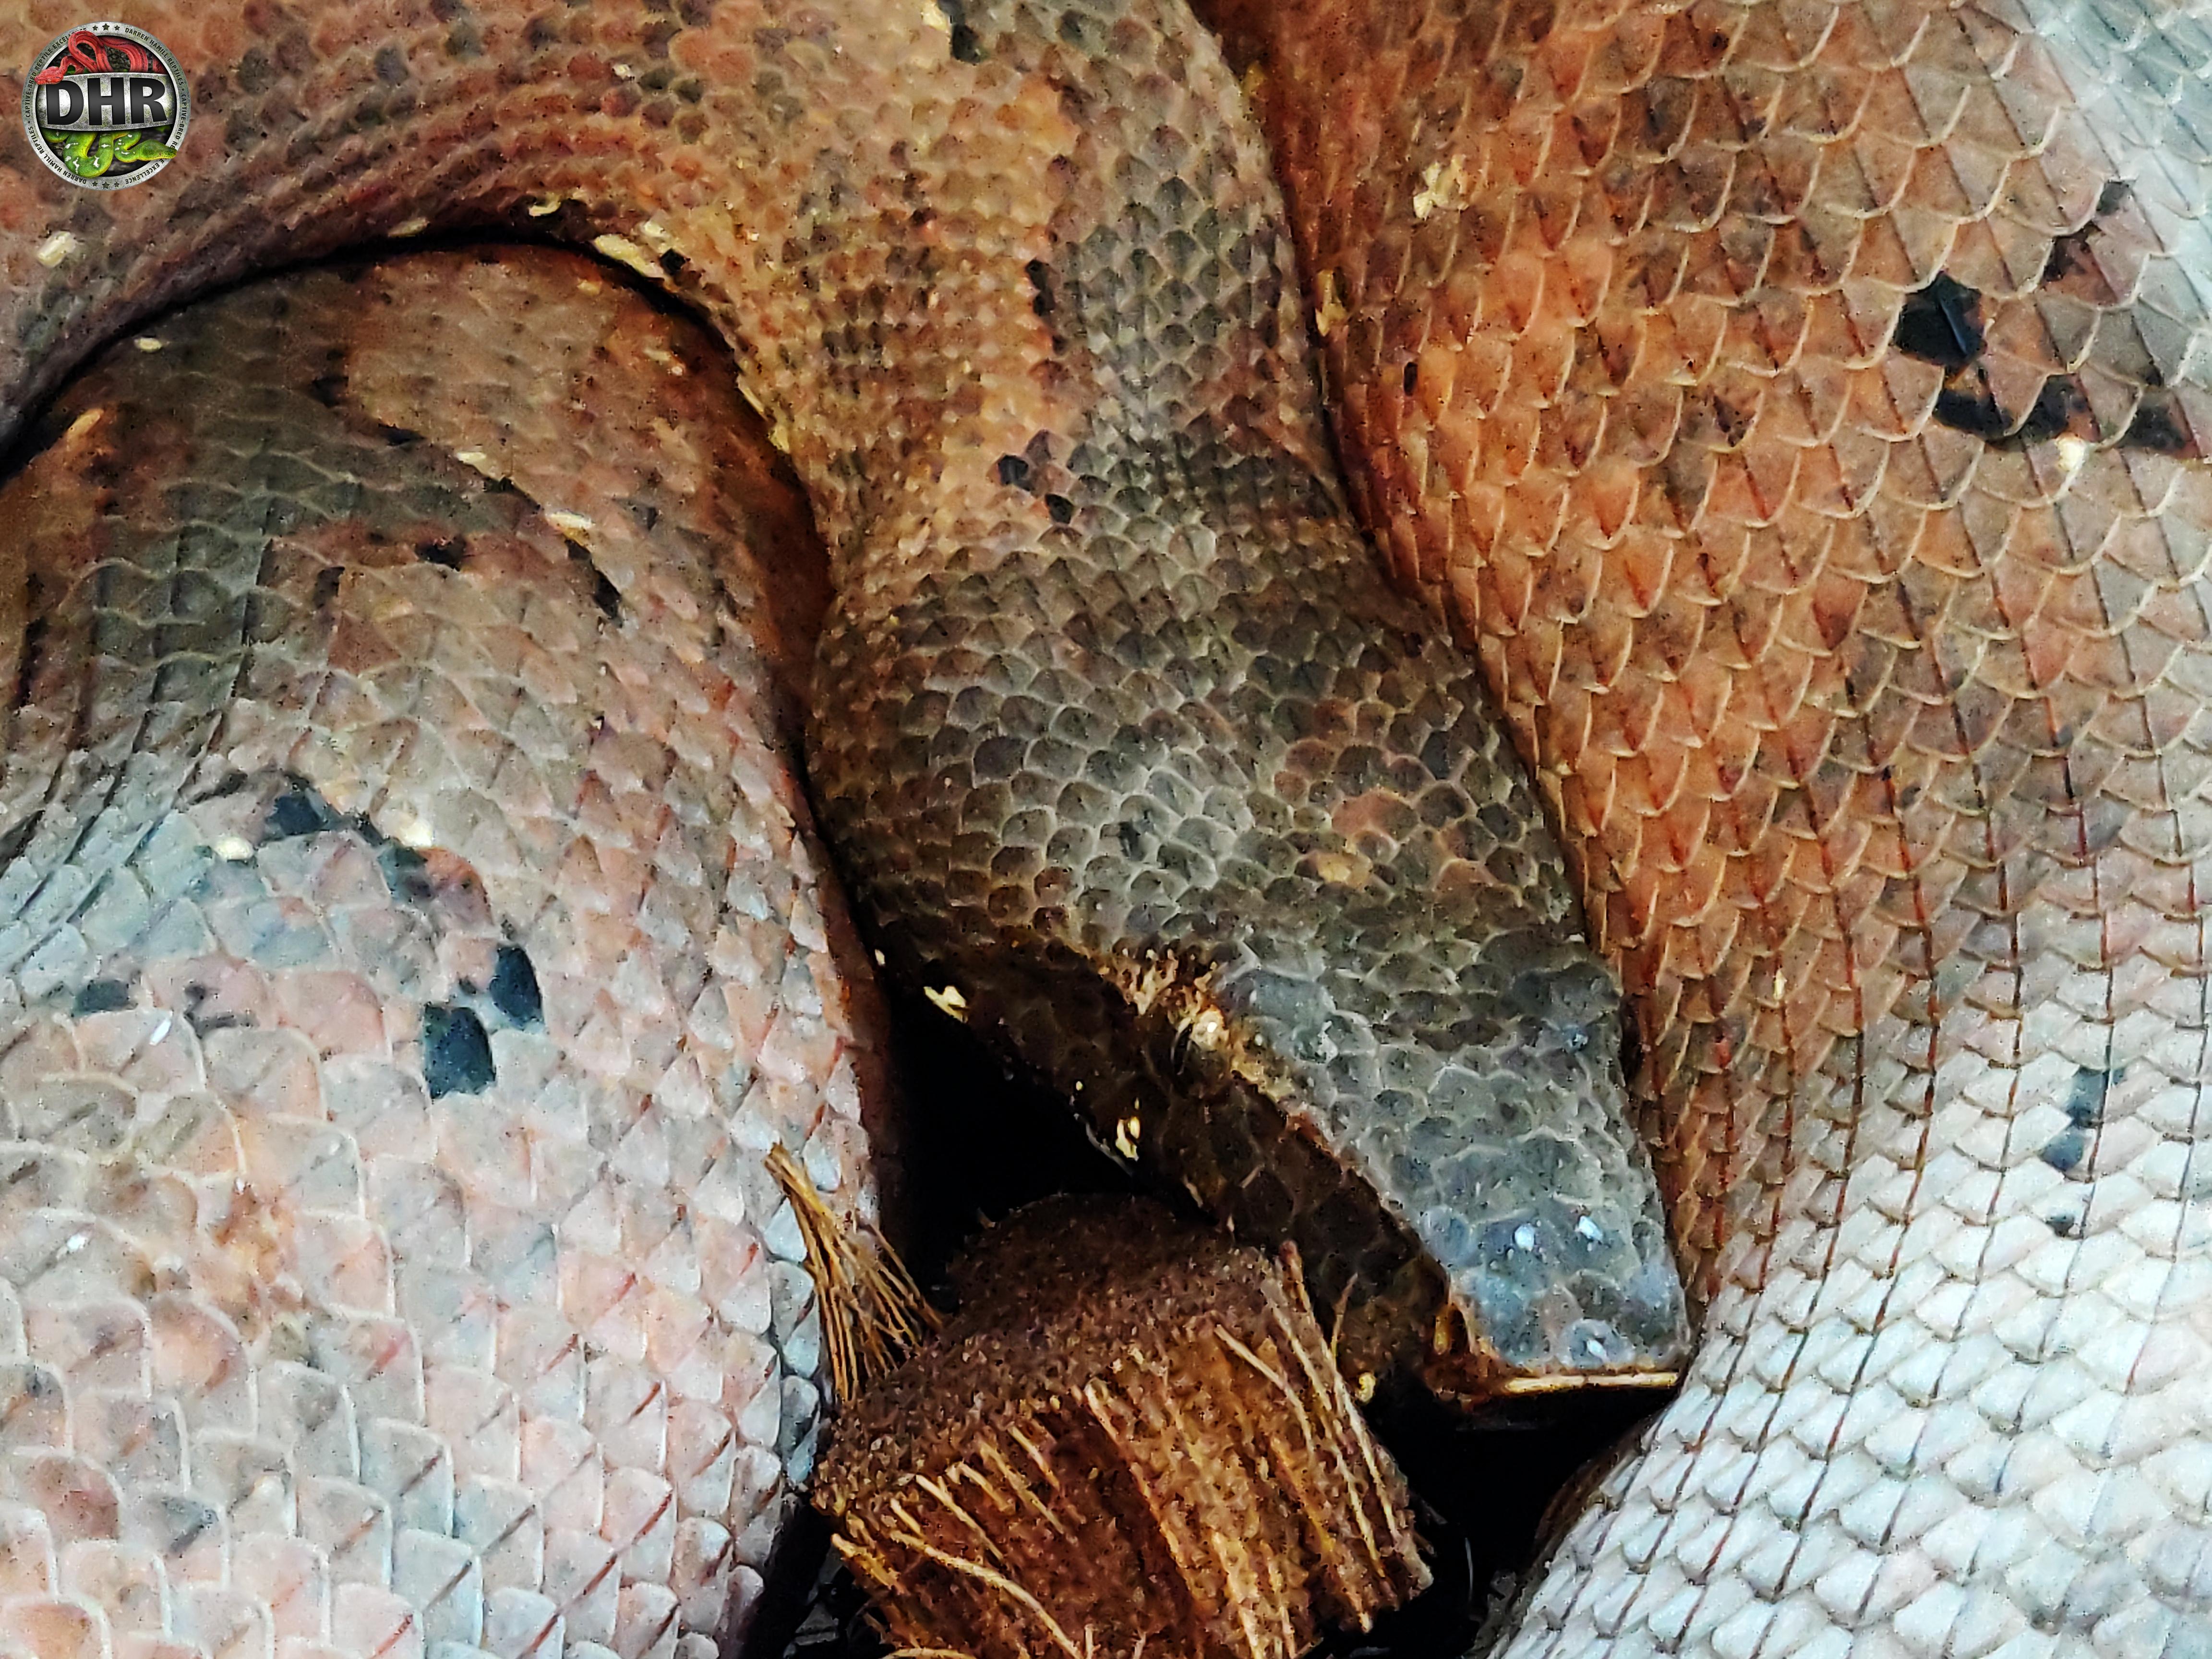 An adult female Solomon Isle Ground Boa